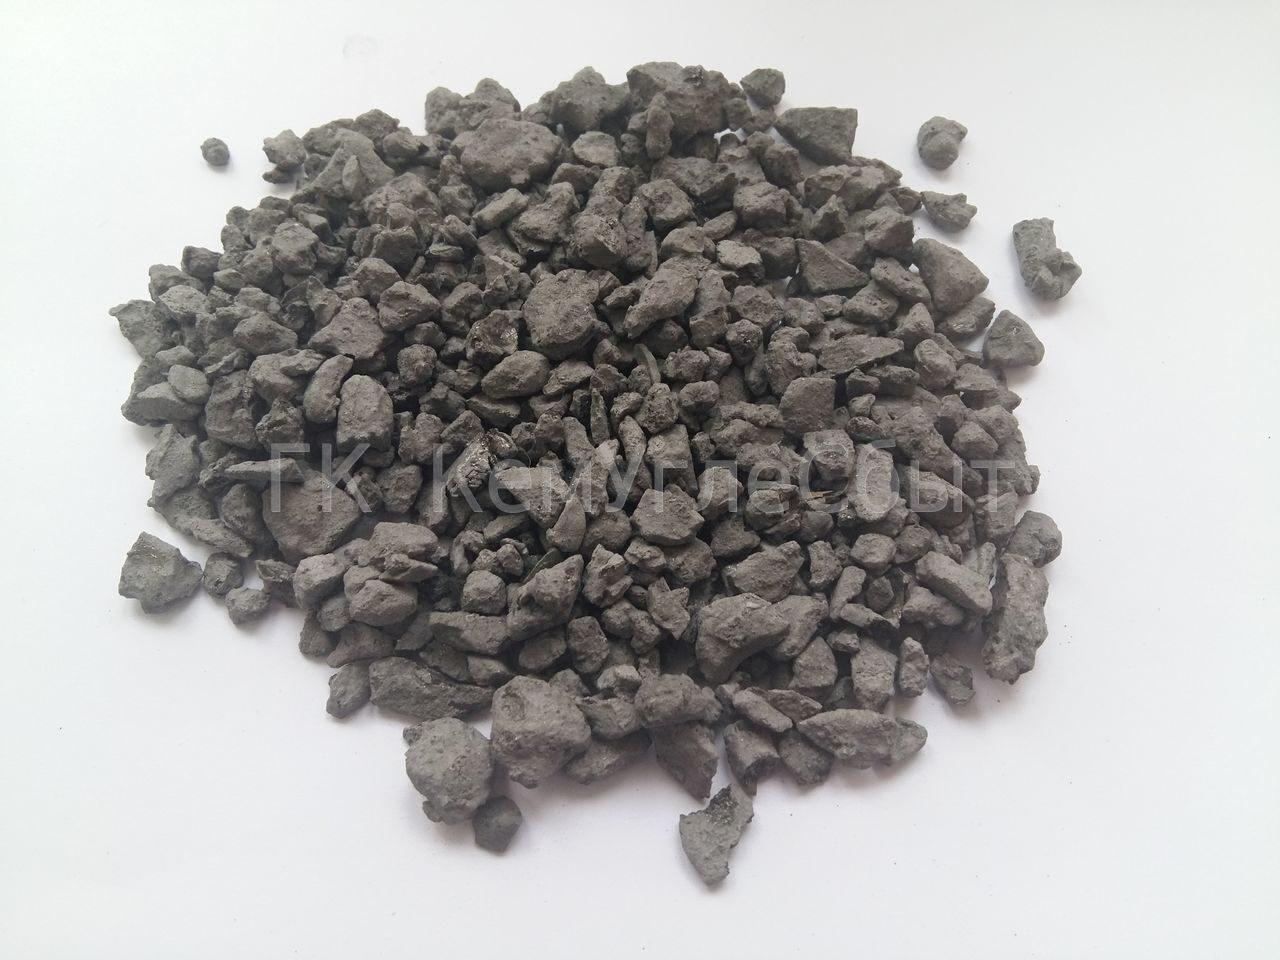 образец заявки на поставку угля